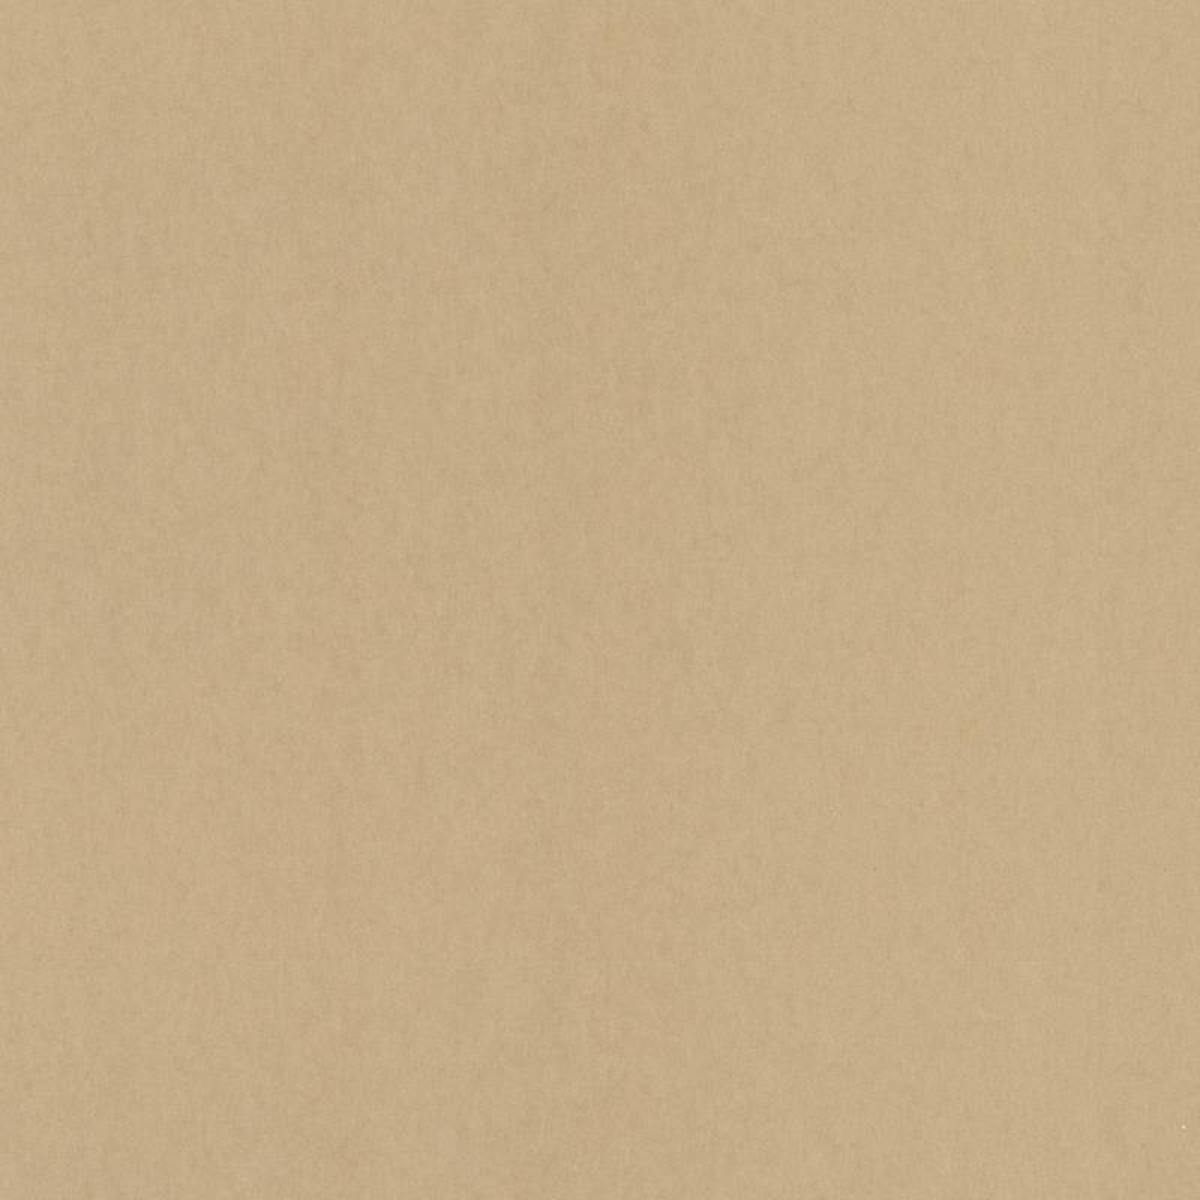 Обои флизелиновые Decor Deluxe International Vivaldi желтые 0.53 м B03002/469